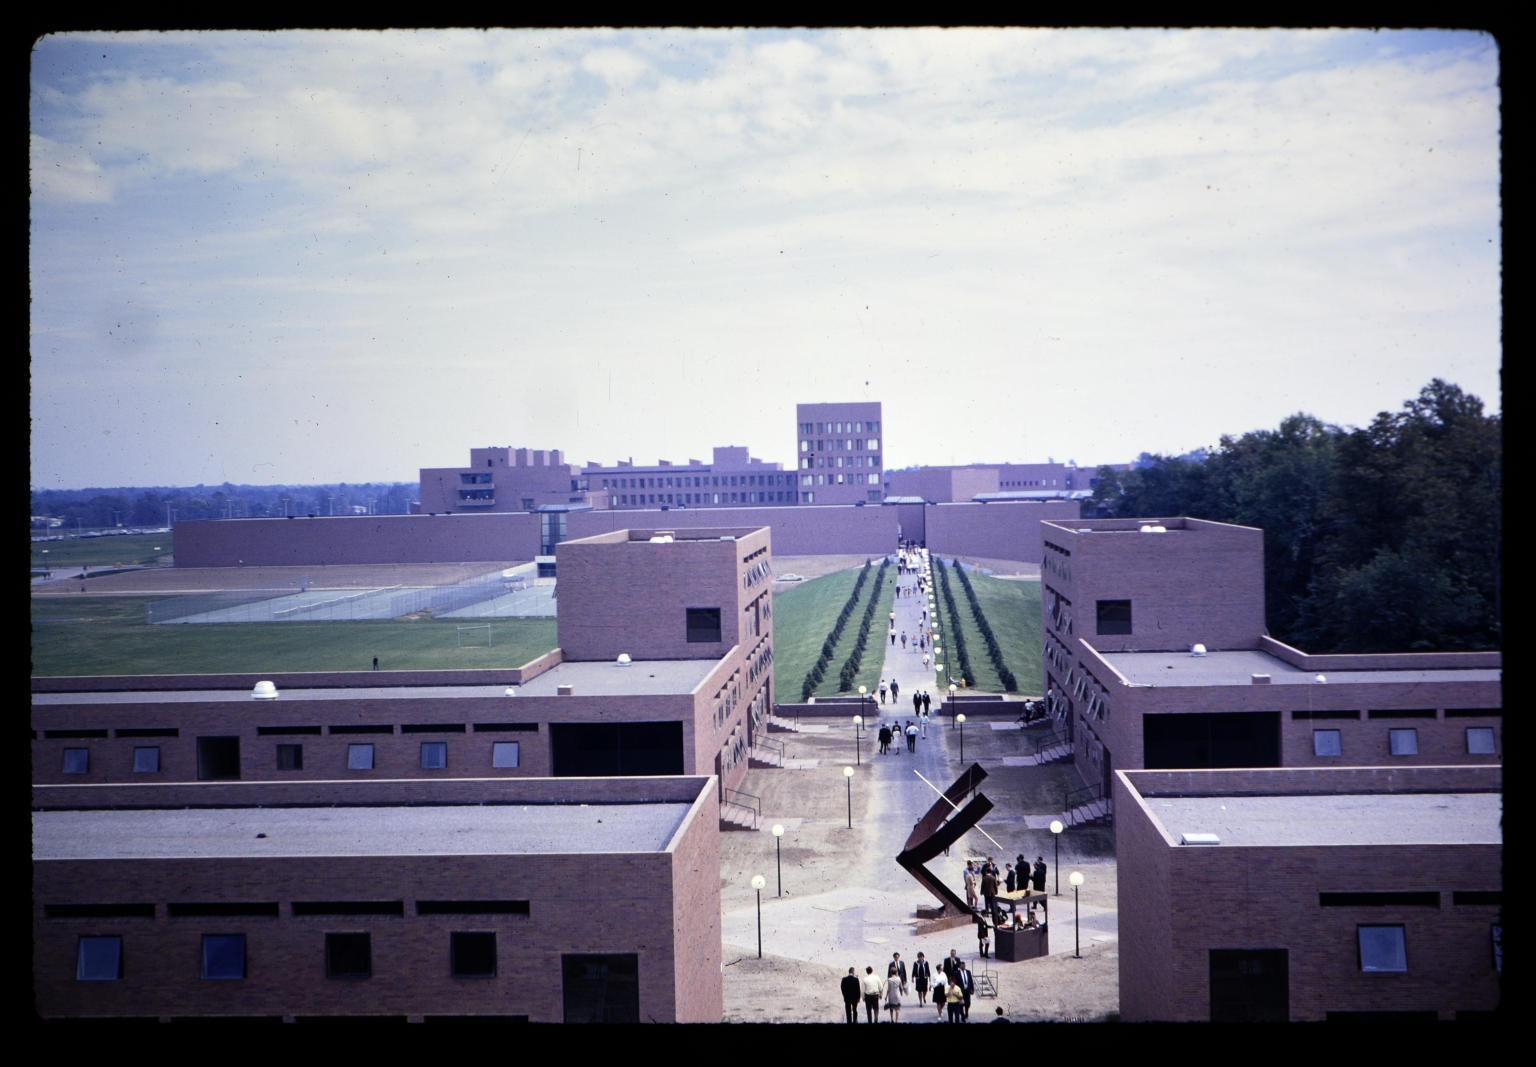 Walkway on RIT campus